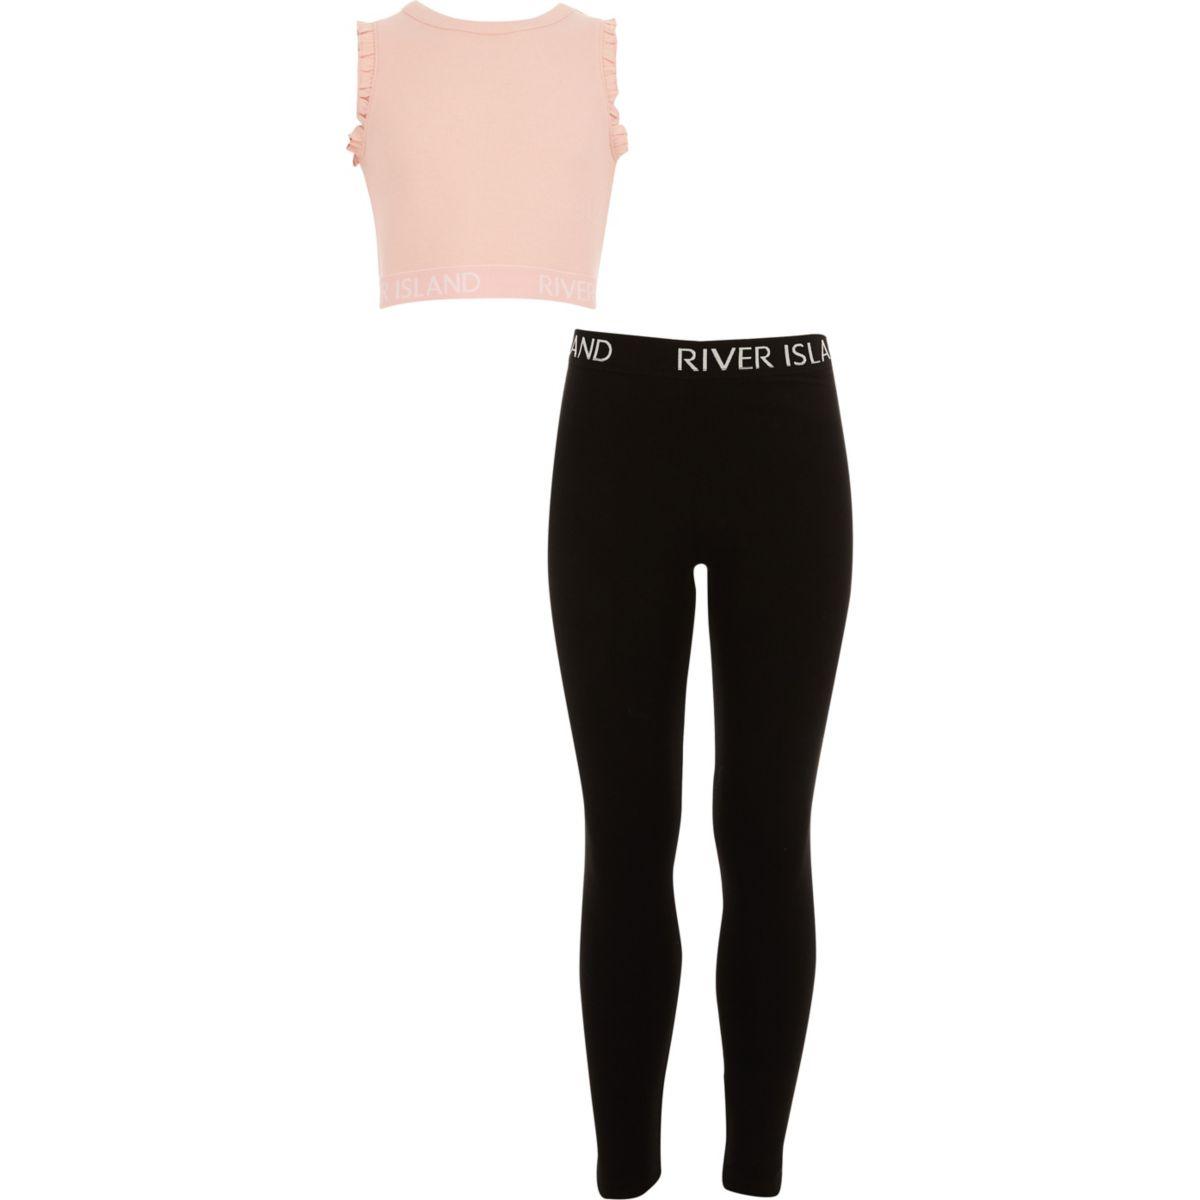 Outfit mit pinkem Crop Top